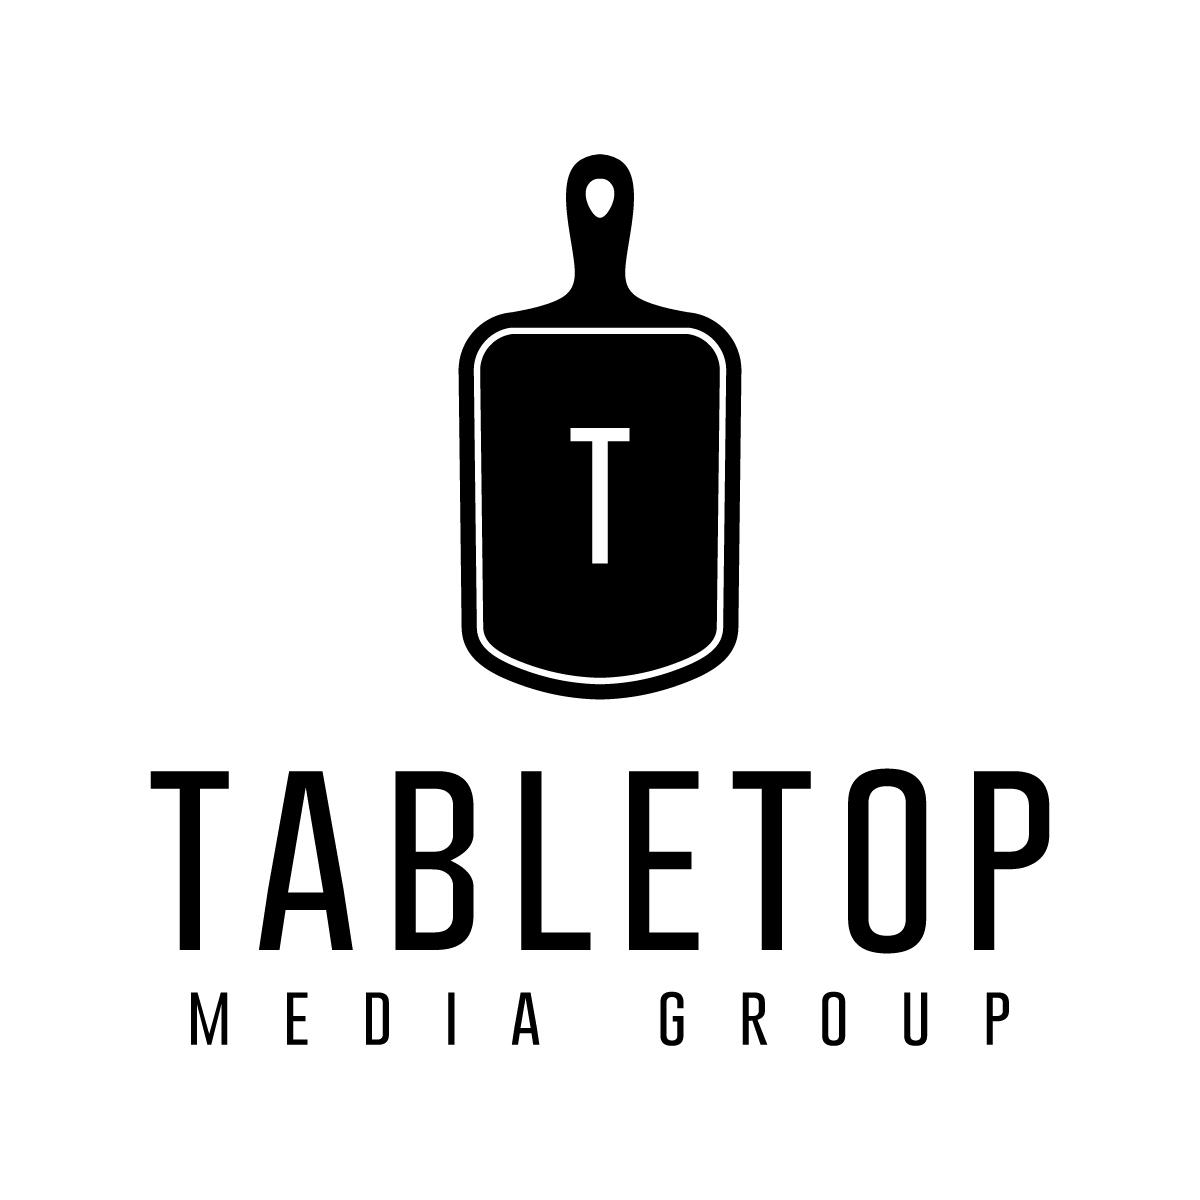 TabletopMGLogo_Vertical_CMYK-01.jpg